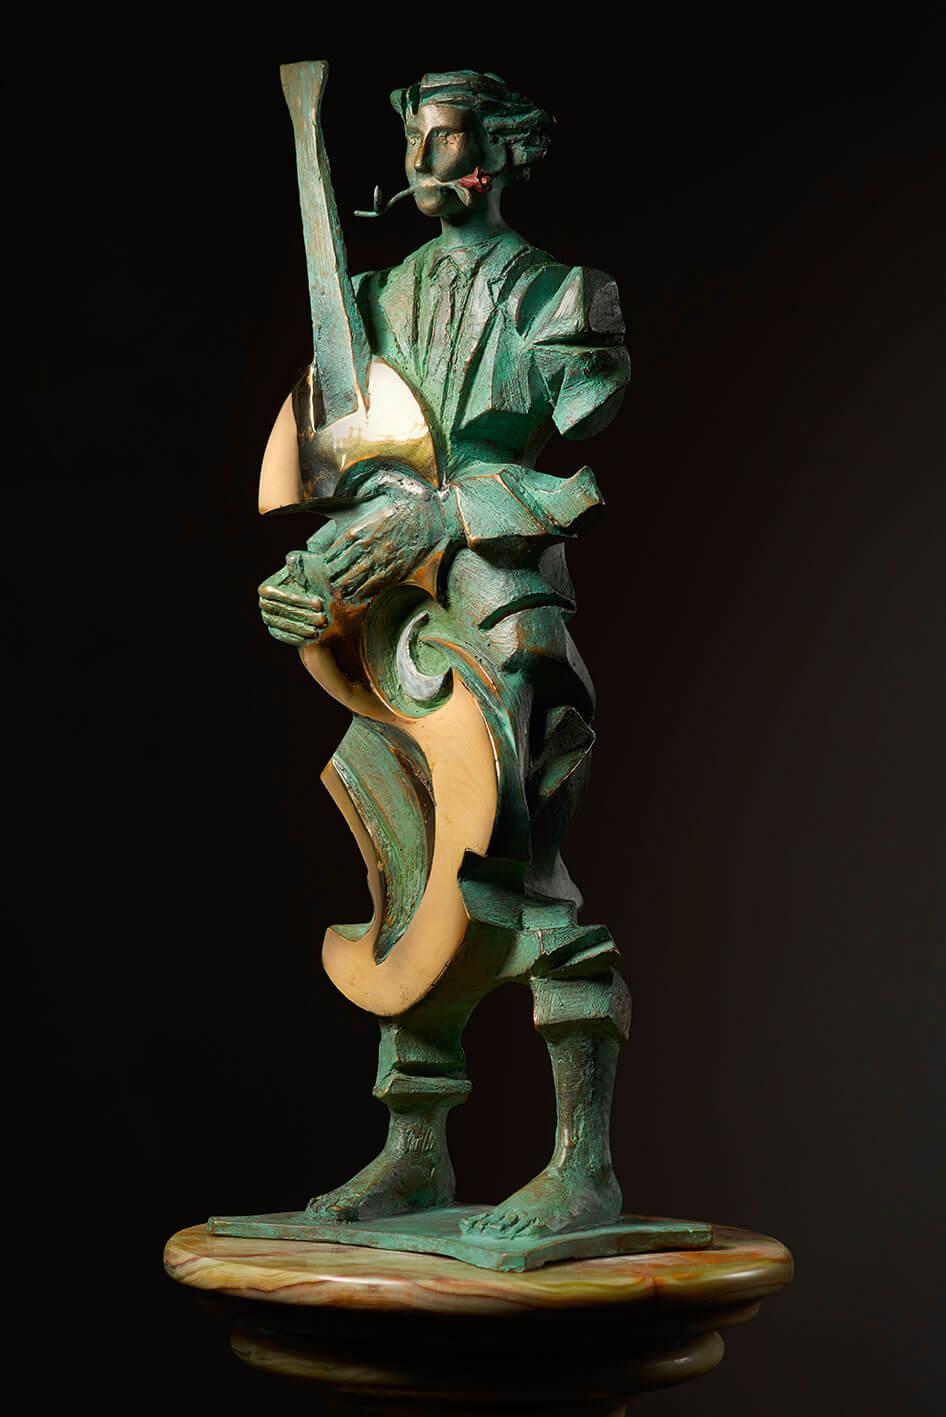 Musica-nel-vento--H46cm---Multiplo-in-bronzo-75-esemplari